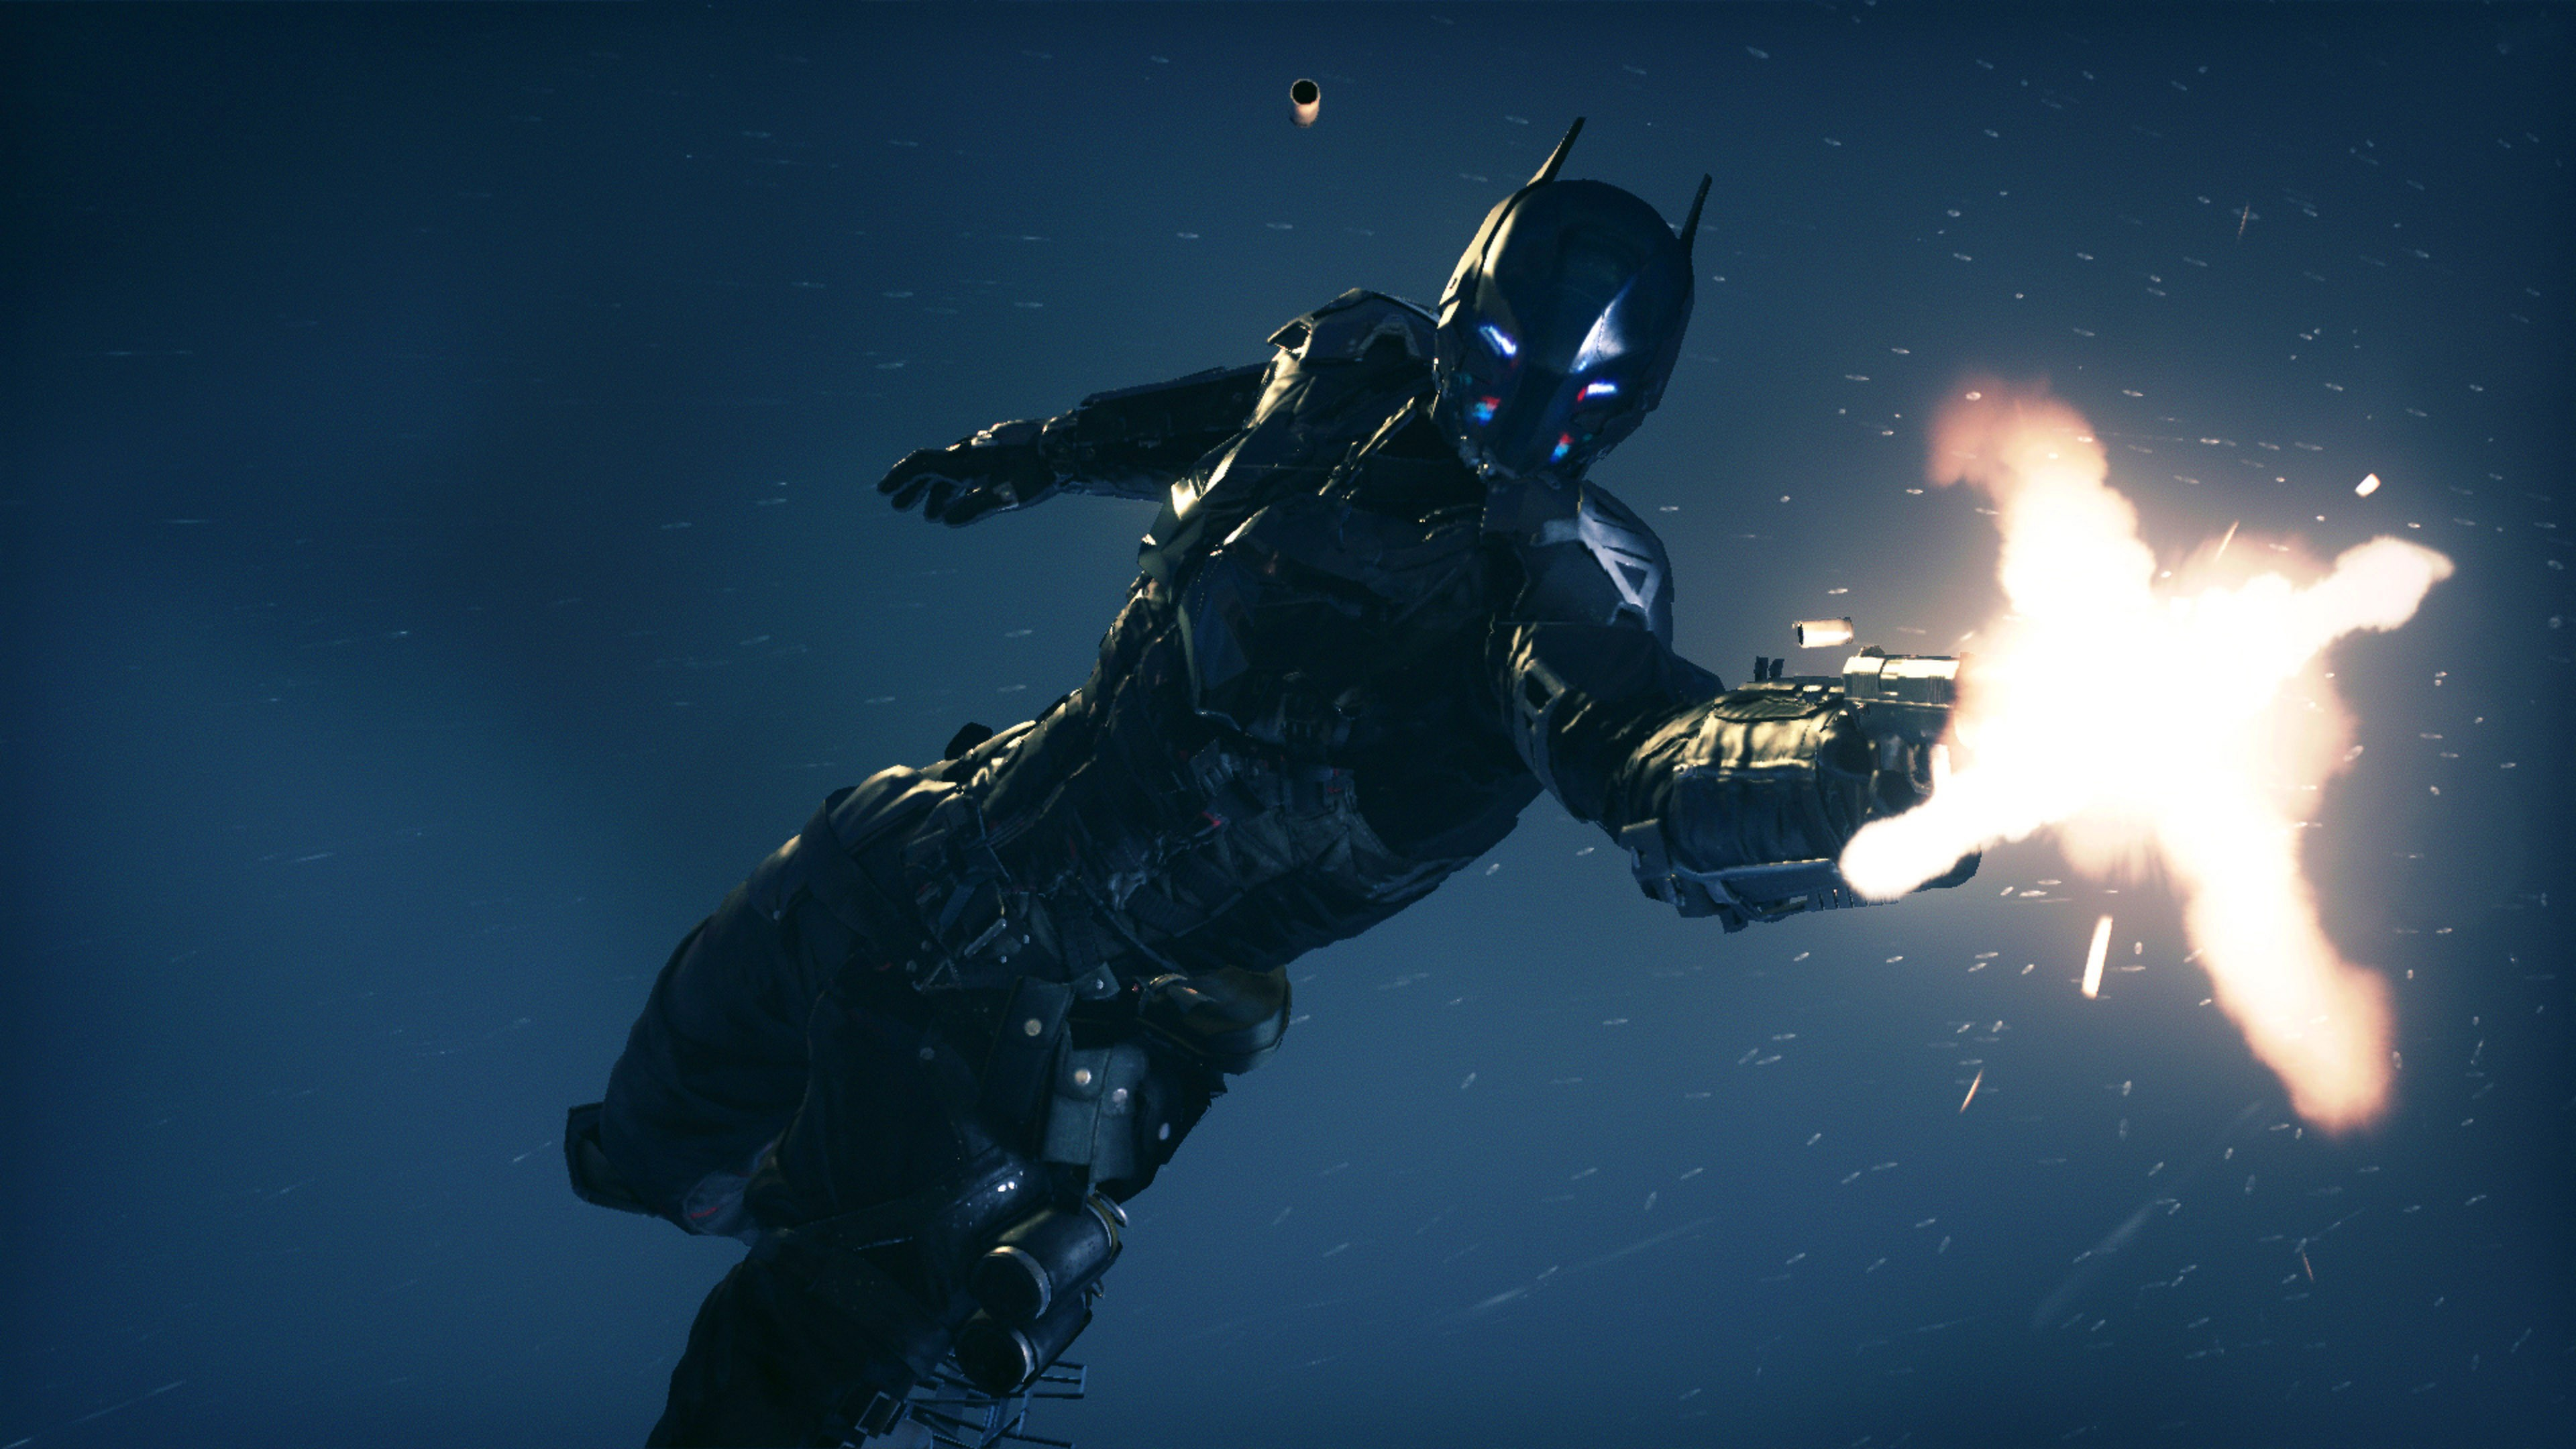 2k Batman Arkham Knight 113477 Hd Wallpaper Backgrounds